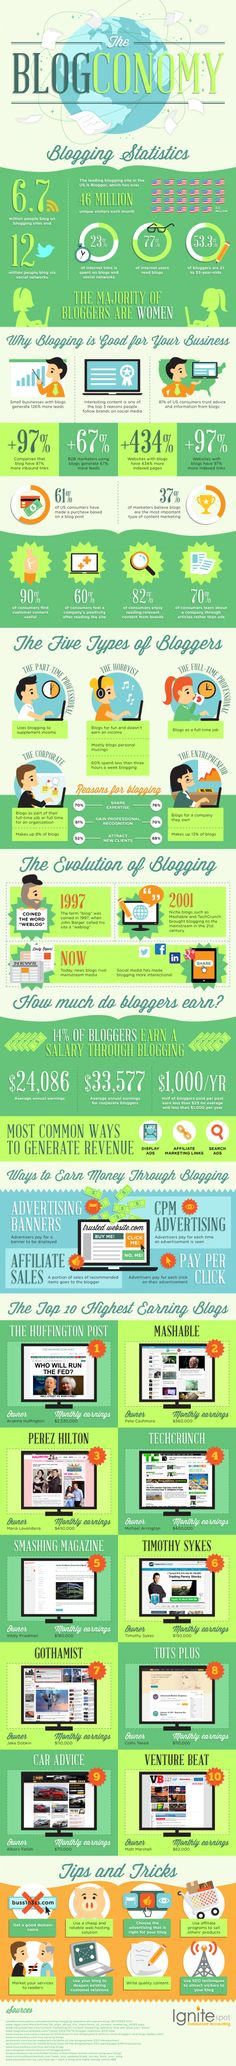 The Blogconomy [info